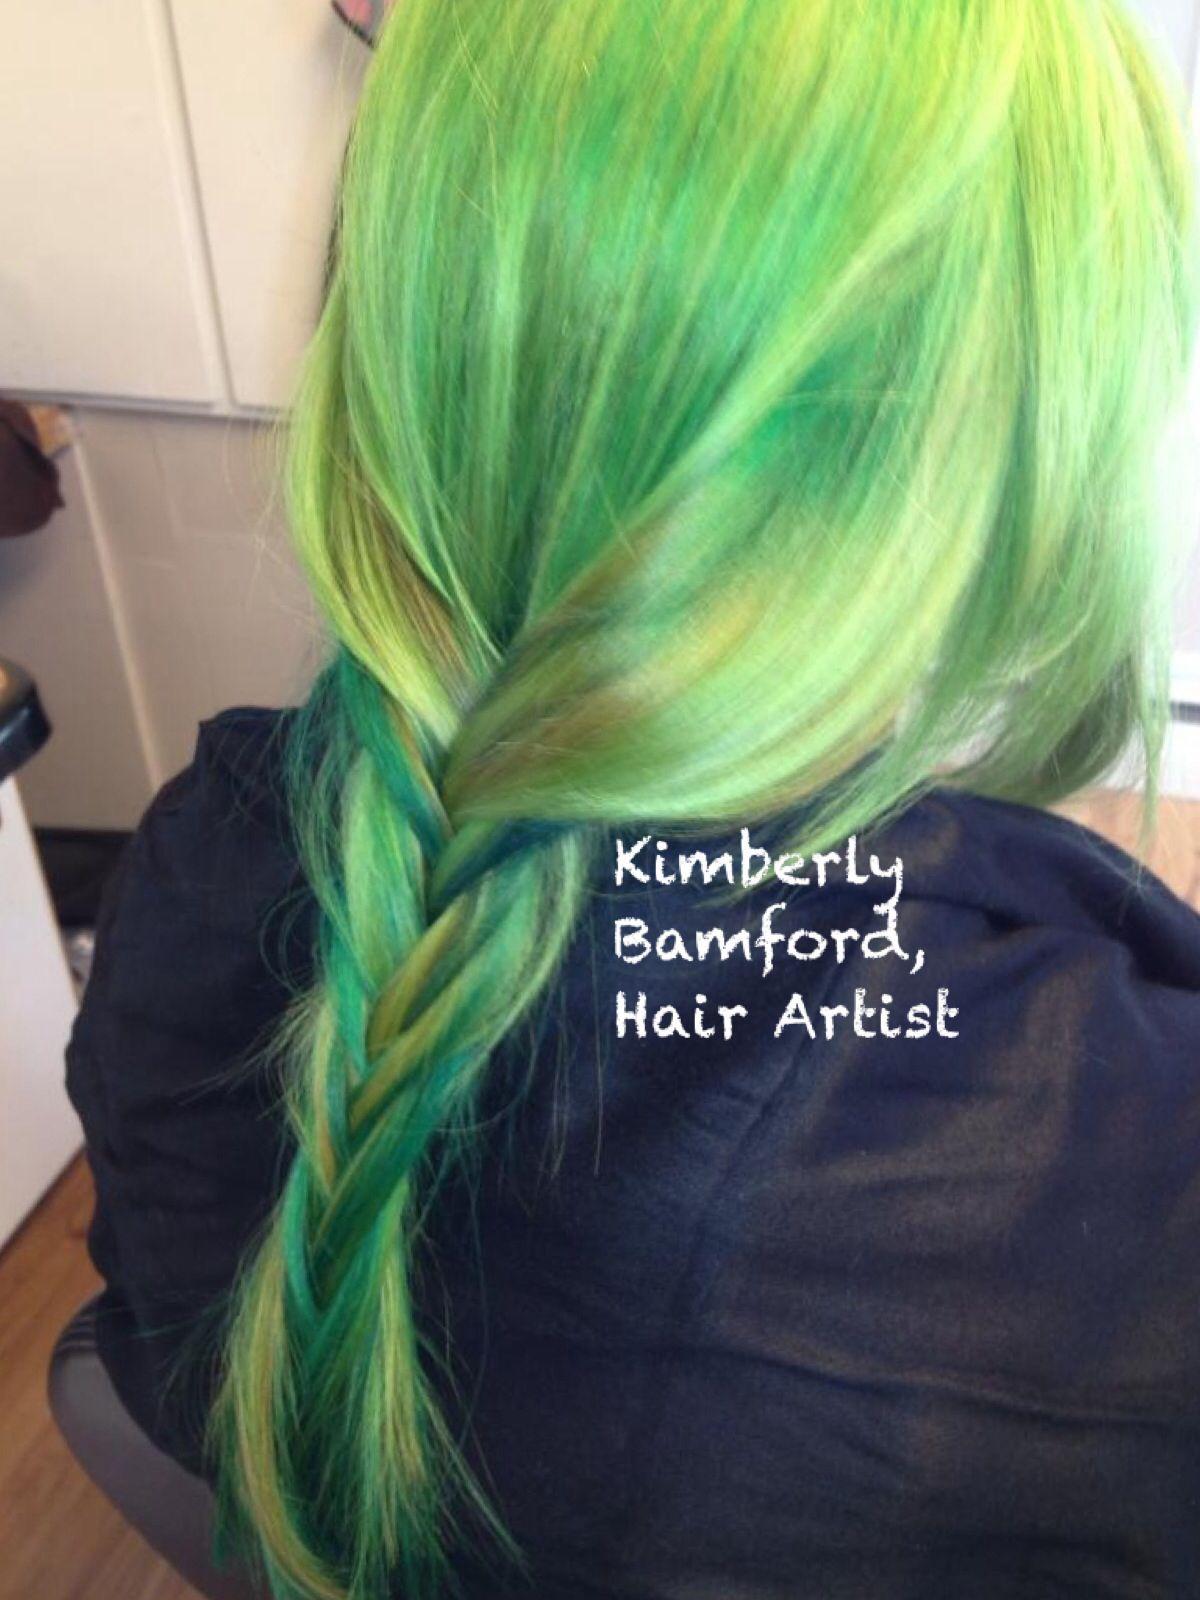 Green and yellow Vivids. Green hair greenhair greenvivids vivids haircolor newburyport